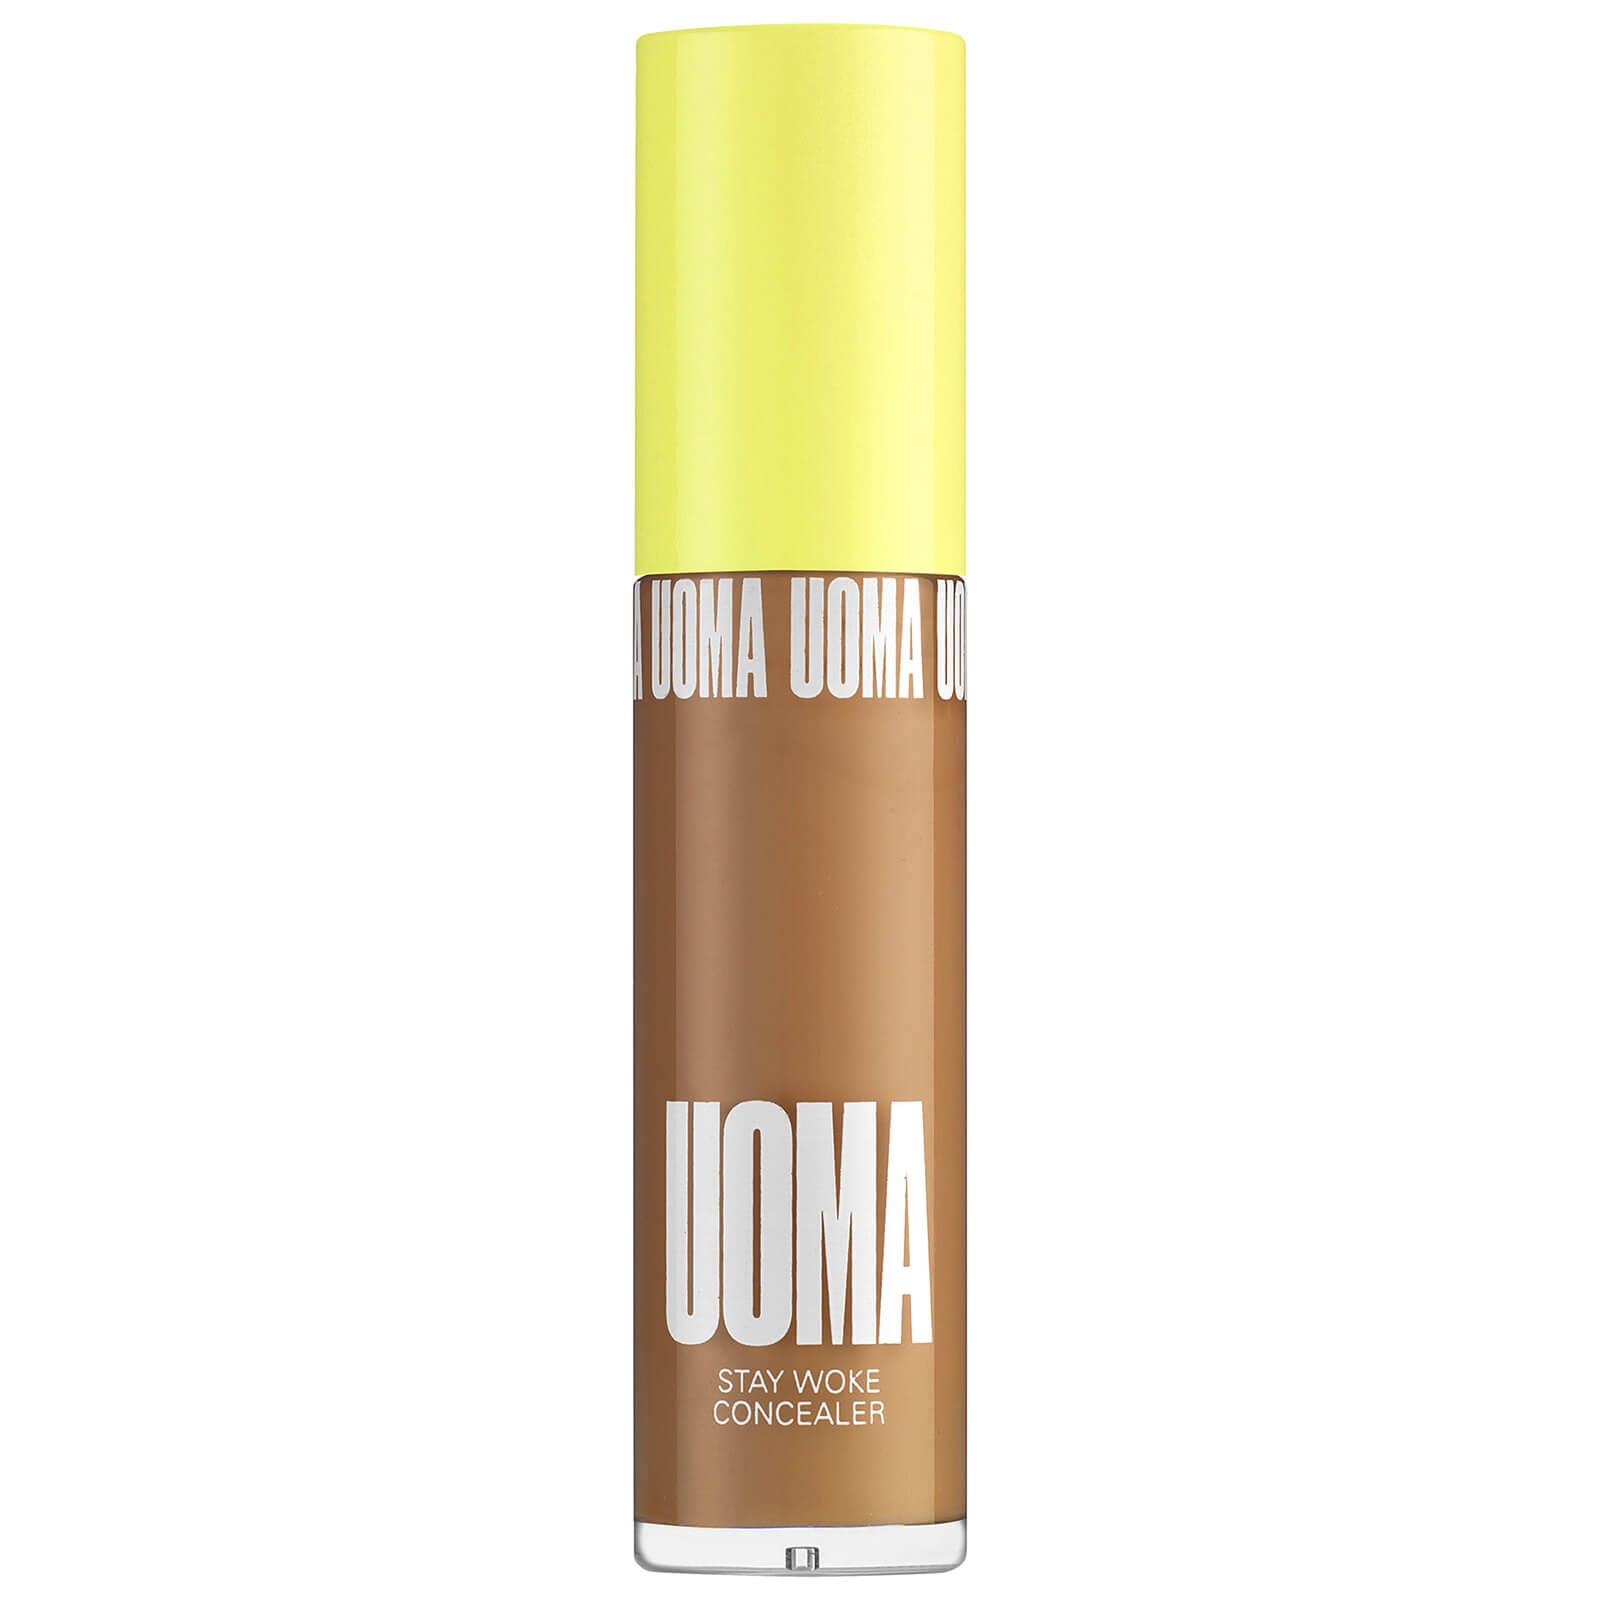 UOMA Beauty Stay Woke Luminous Brightening Concealer 30ml (Various Shades) - Bronze Venus T3